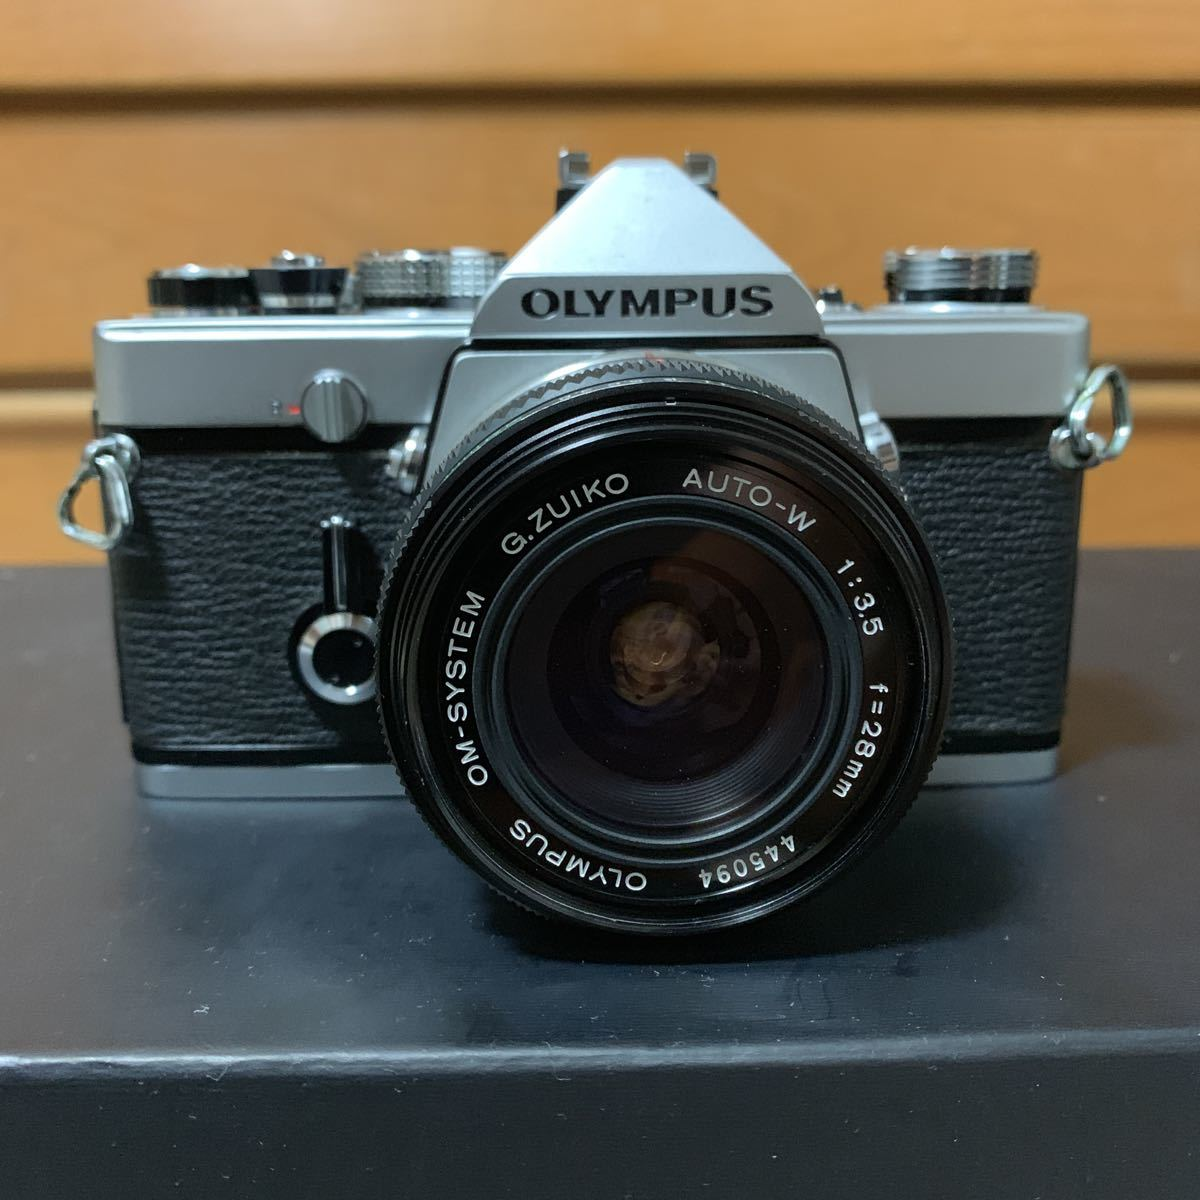 ◆ OLYMPUS オリンパス M-1 + G.ZUIKO AUTO-W 28mm F3.5 フィルムカメラ 標準単焦点 広角単焦点